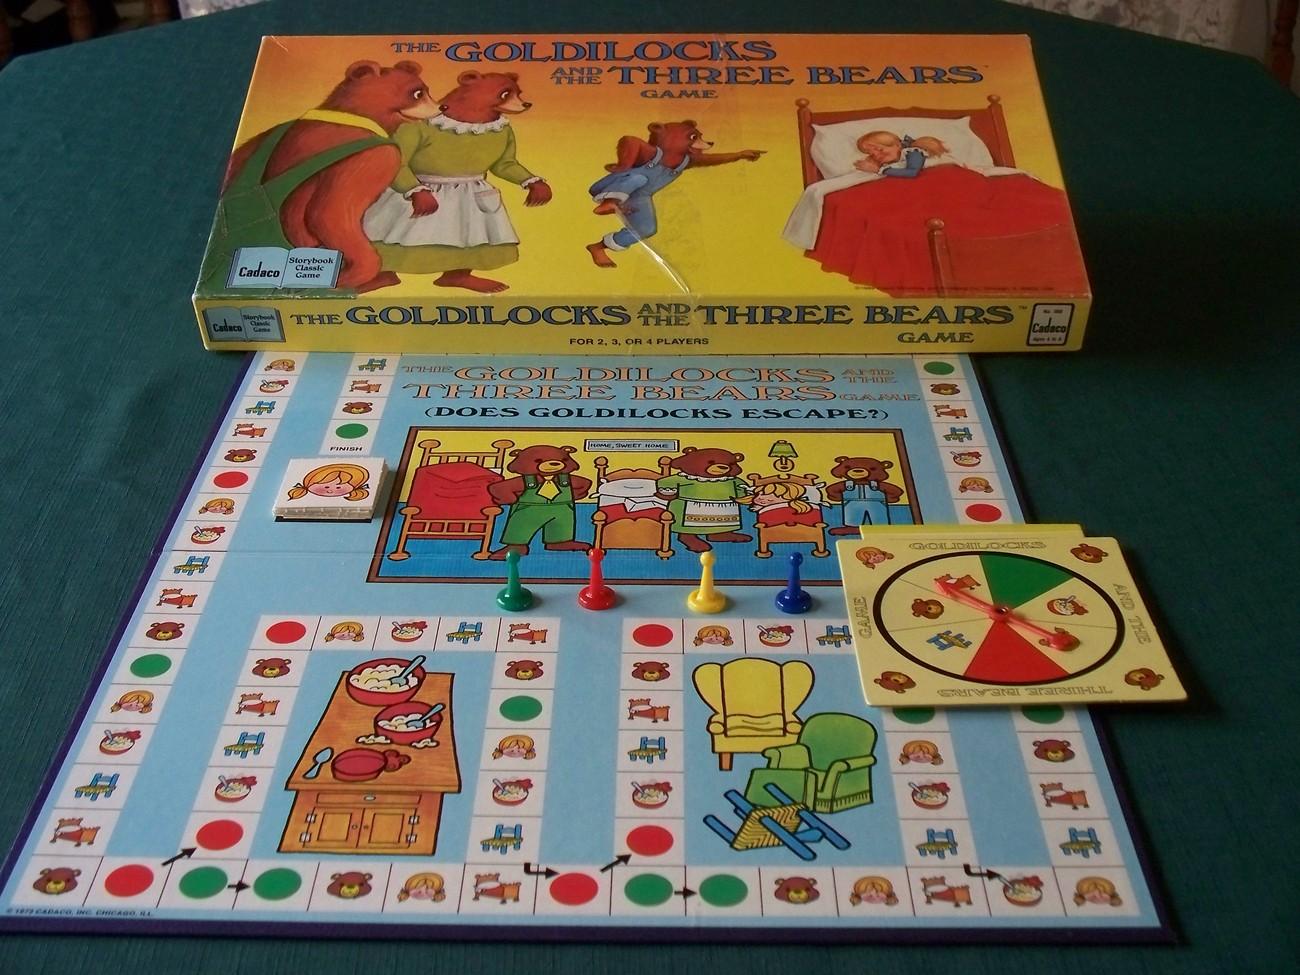 Goldilocks And The Three Bears Game Cadaco 1989 Complete image 2